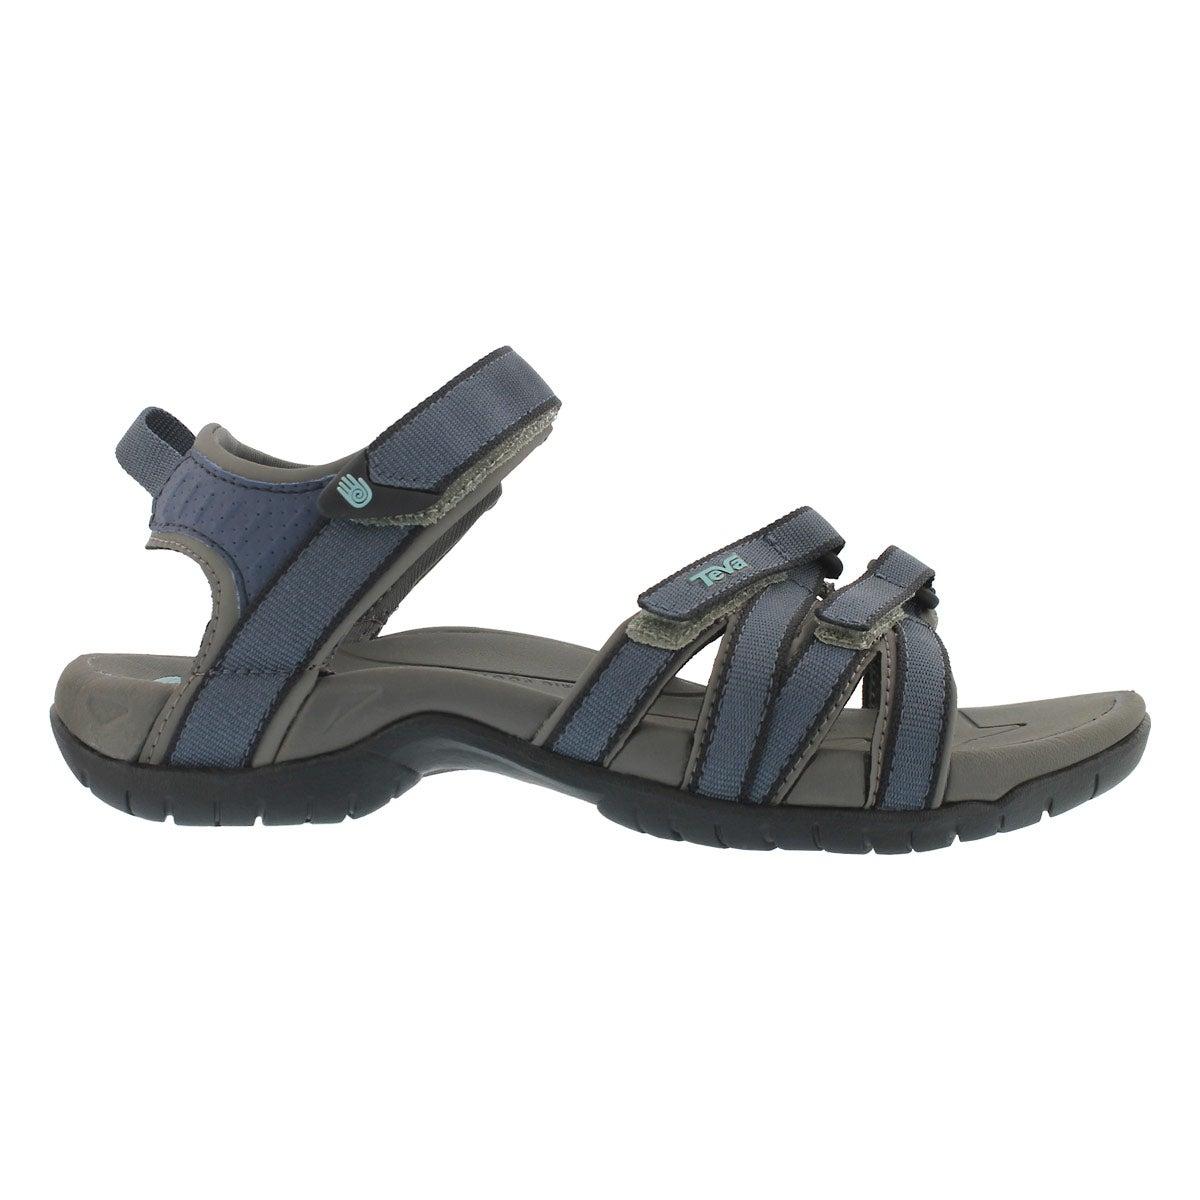 Lds Tirra bering sea sport sandal